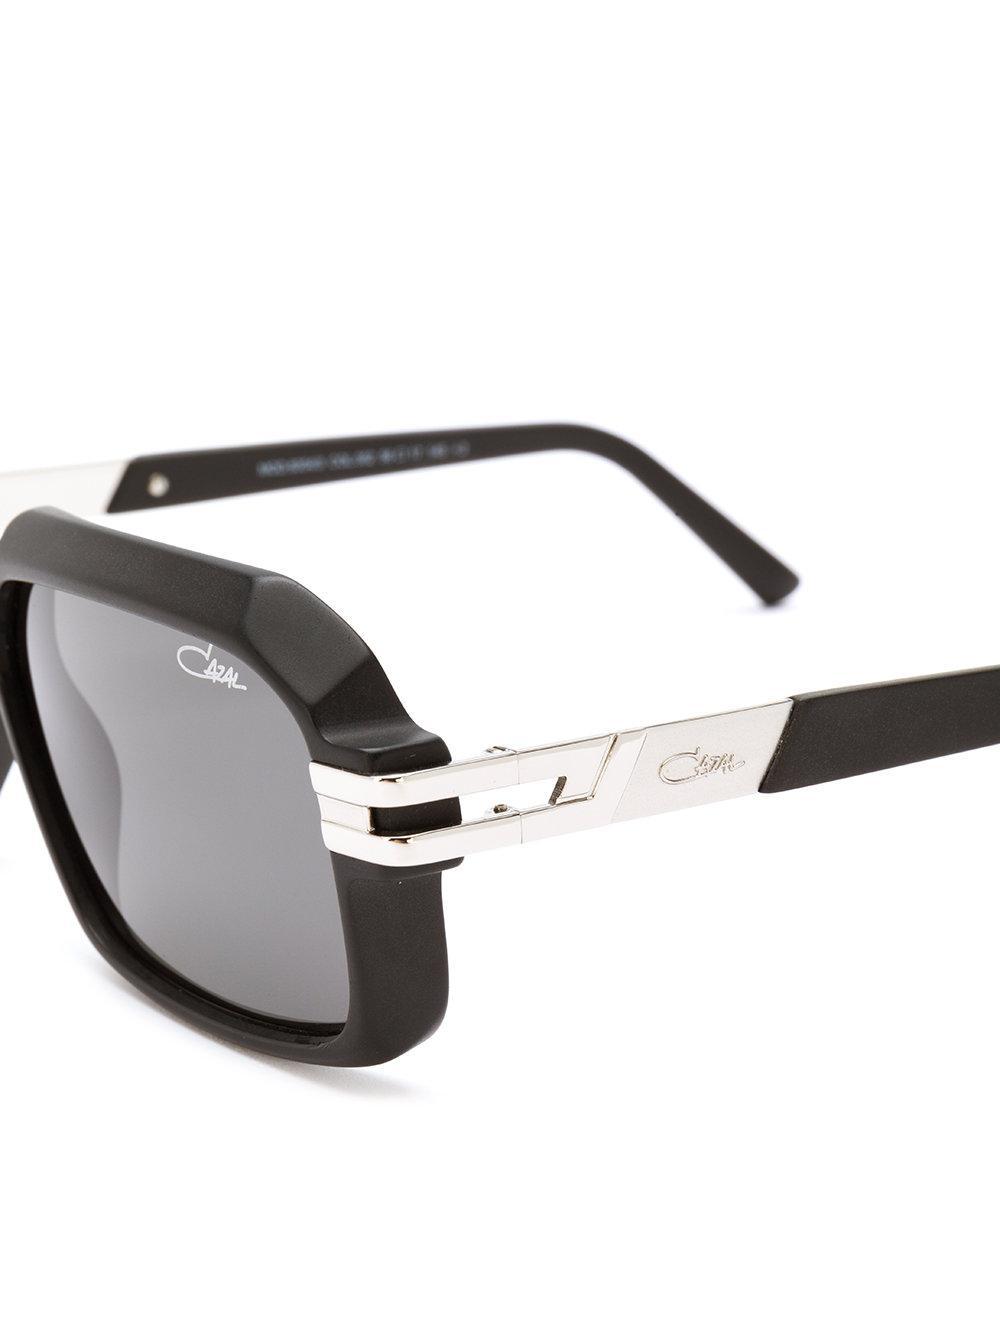 e535b22dd9b Cazal Oversized Sunglasses in Black - Lyst